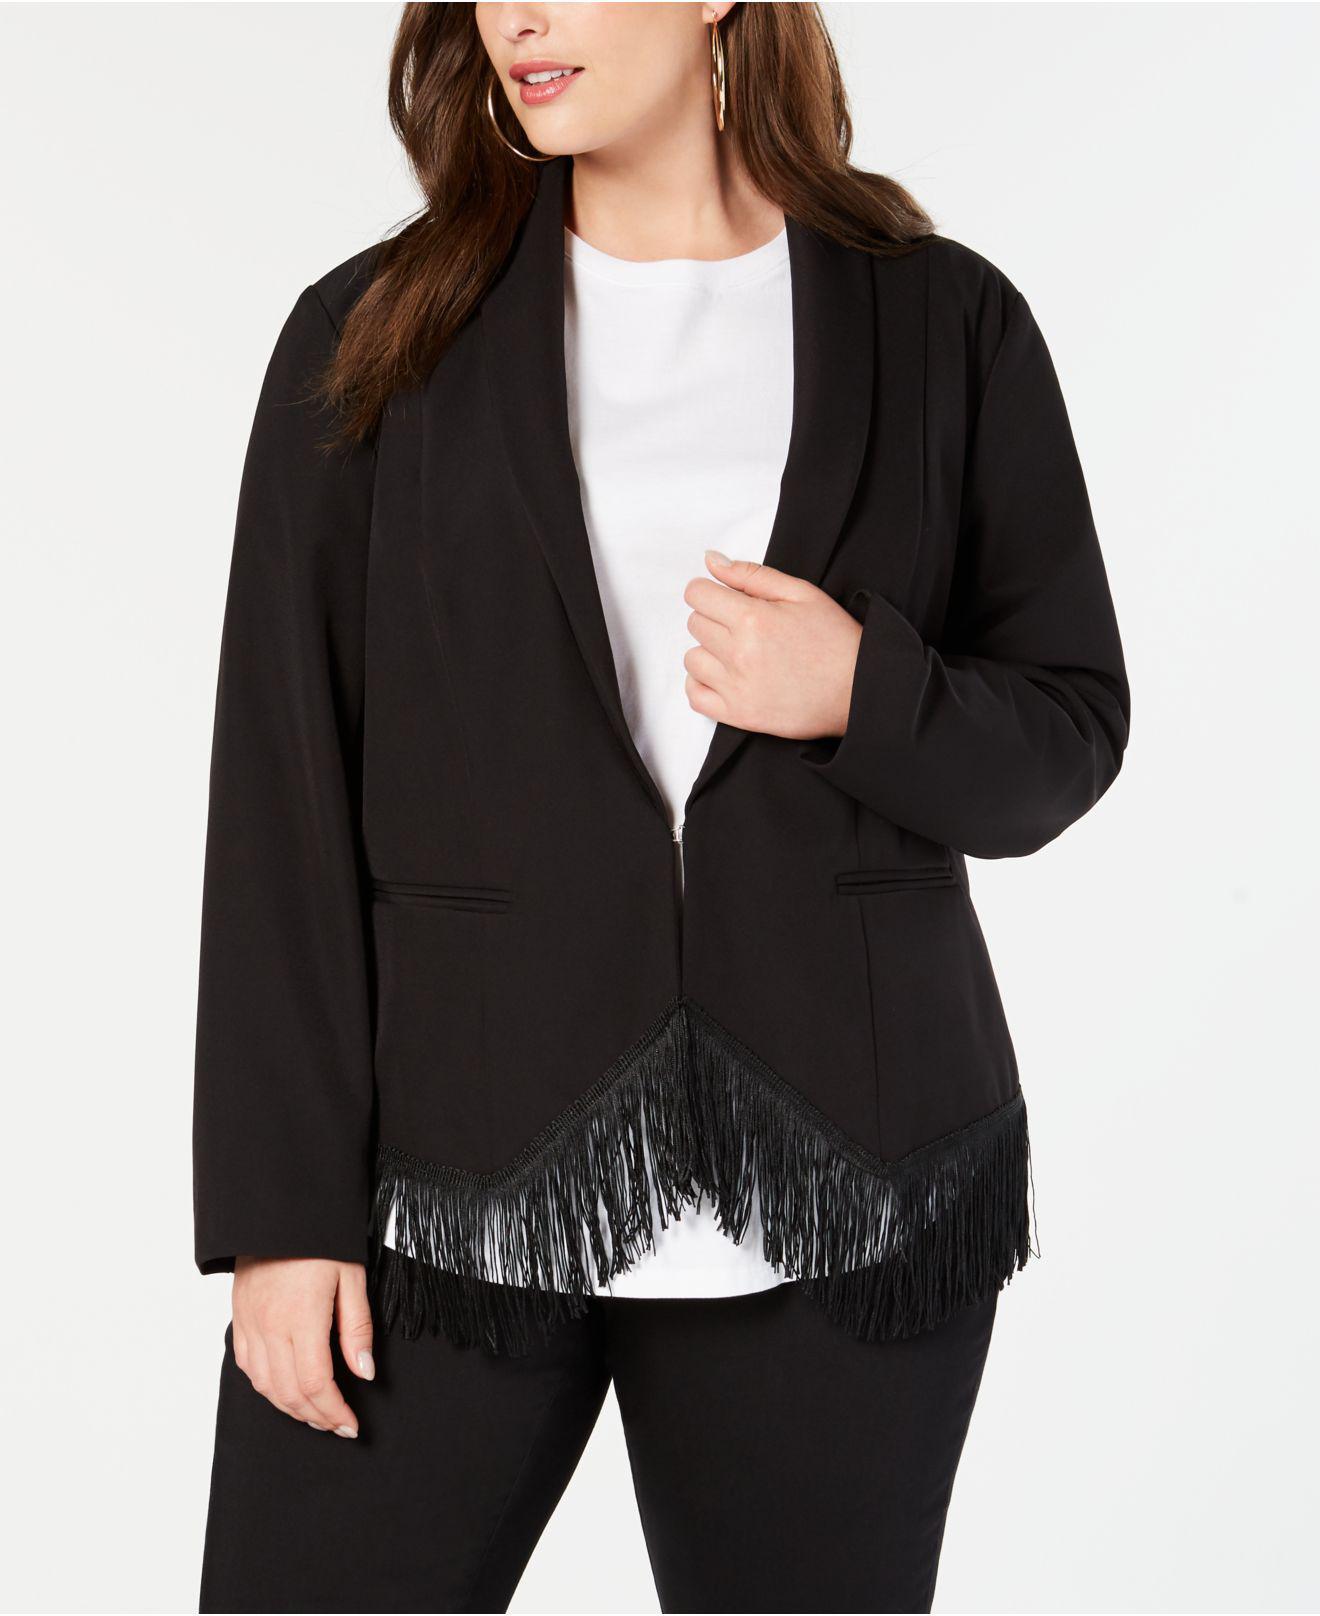 3b25e8a2c0fd5 INC International Concepts. Women s Black I.n.c. Plus Size Fringe-trim  Blazer ...